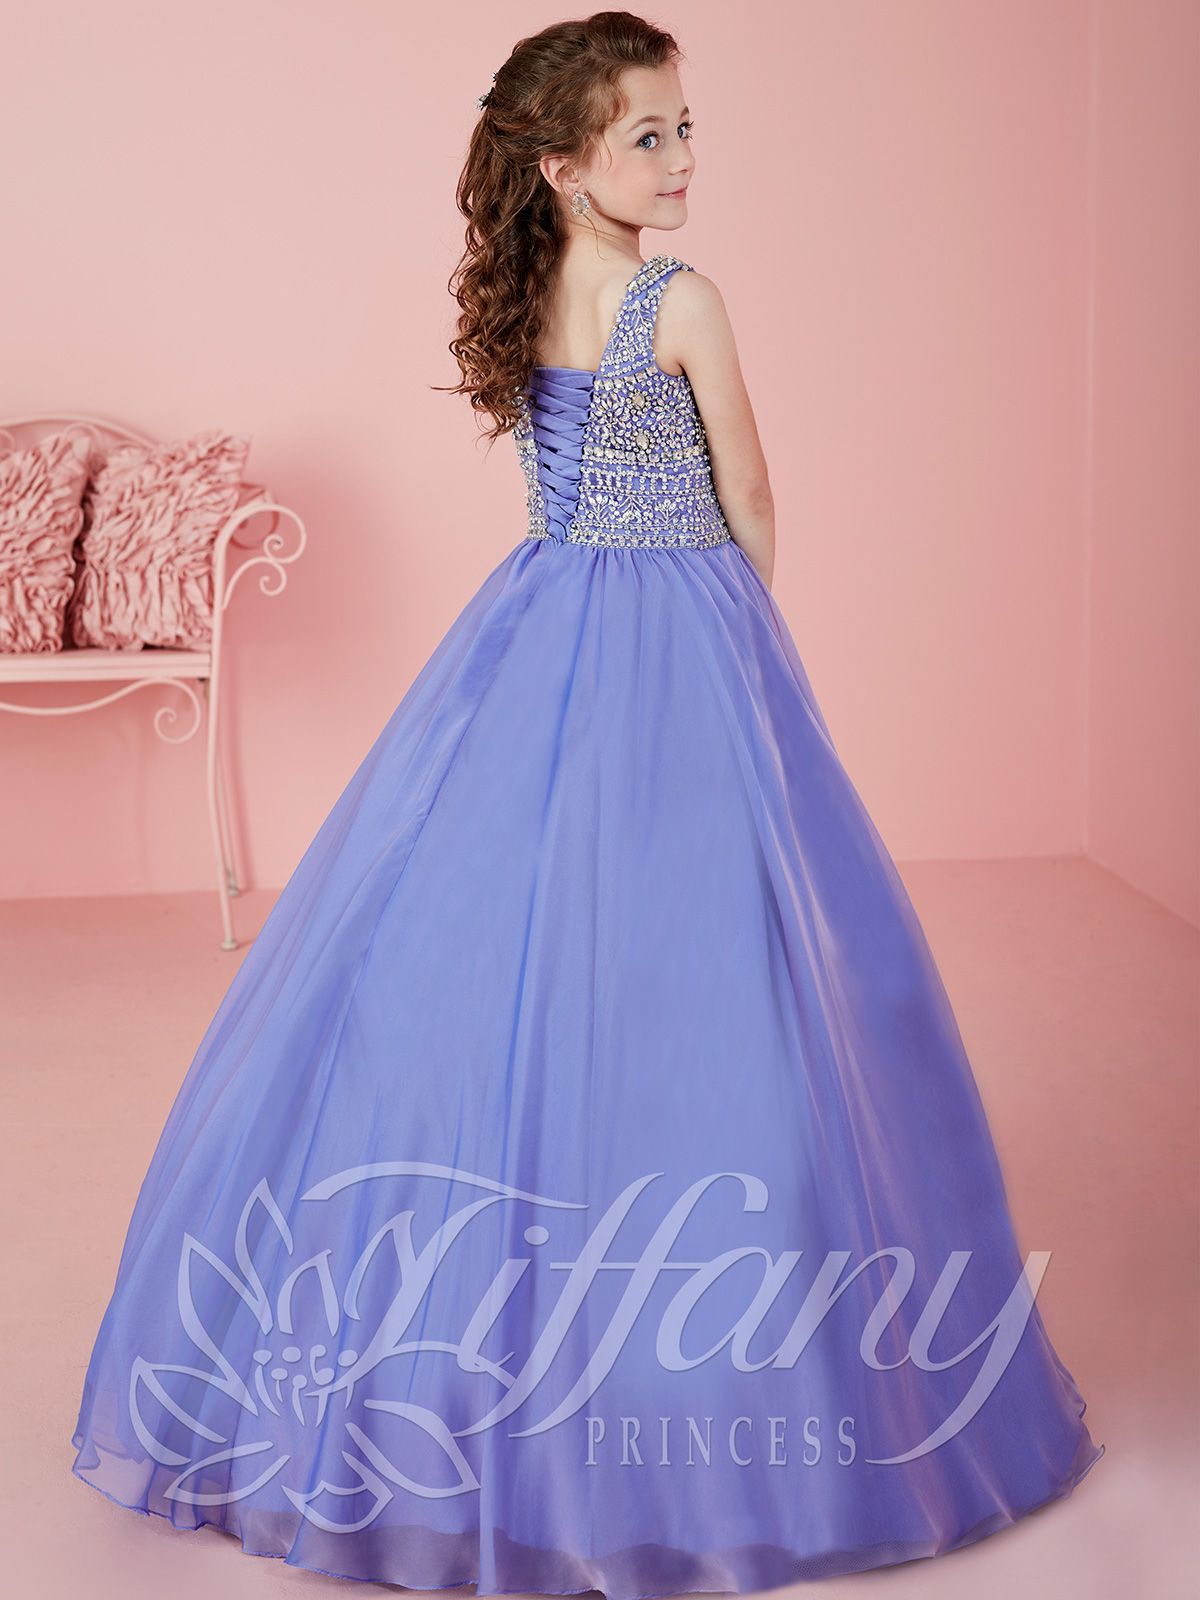 Tiffany Princess 13471 High Scoop Neckline Pageant Dress | Vestidos ...